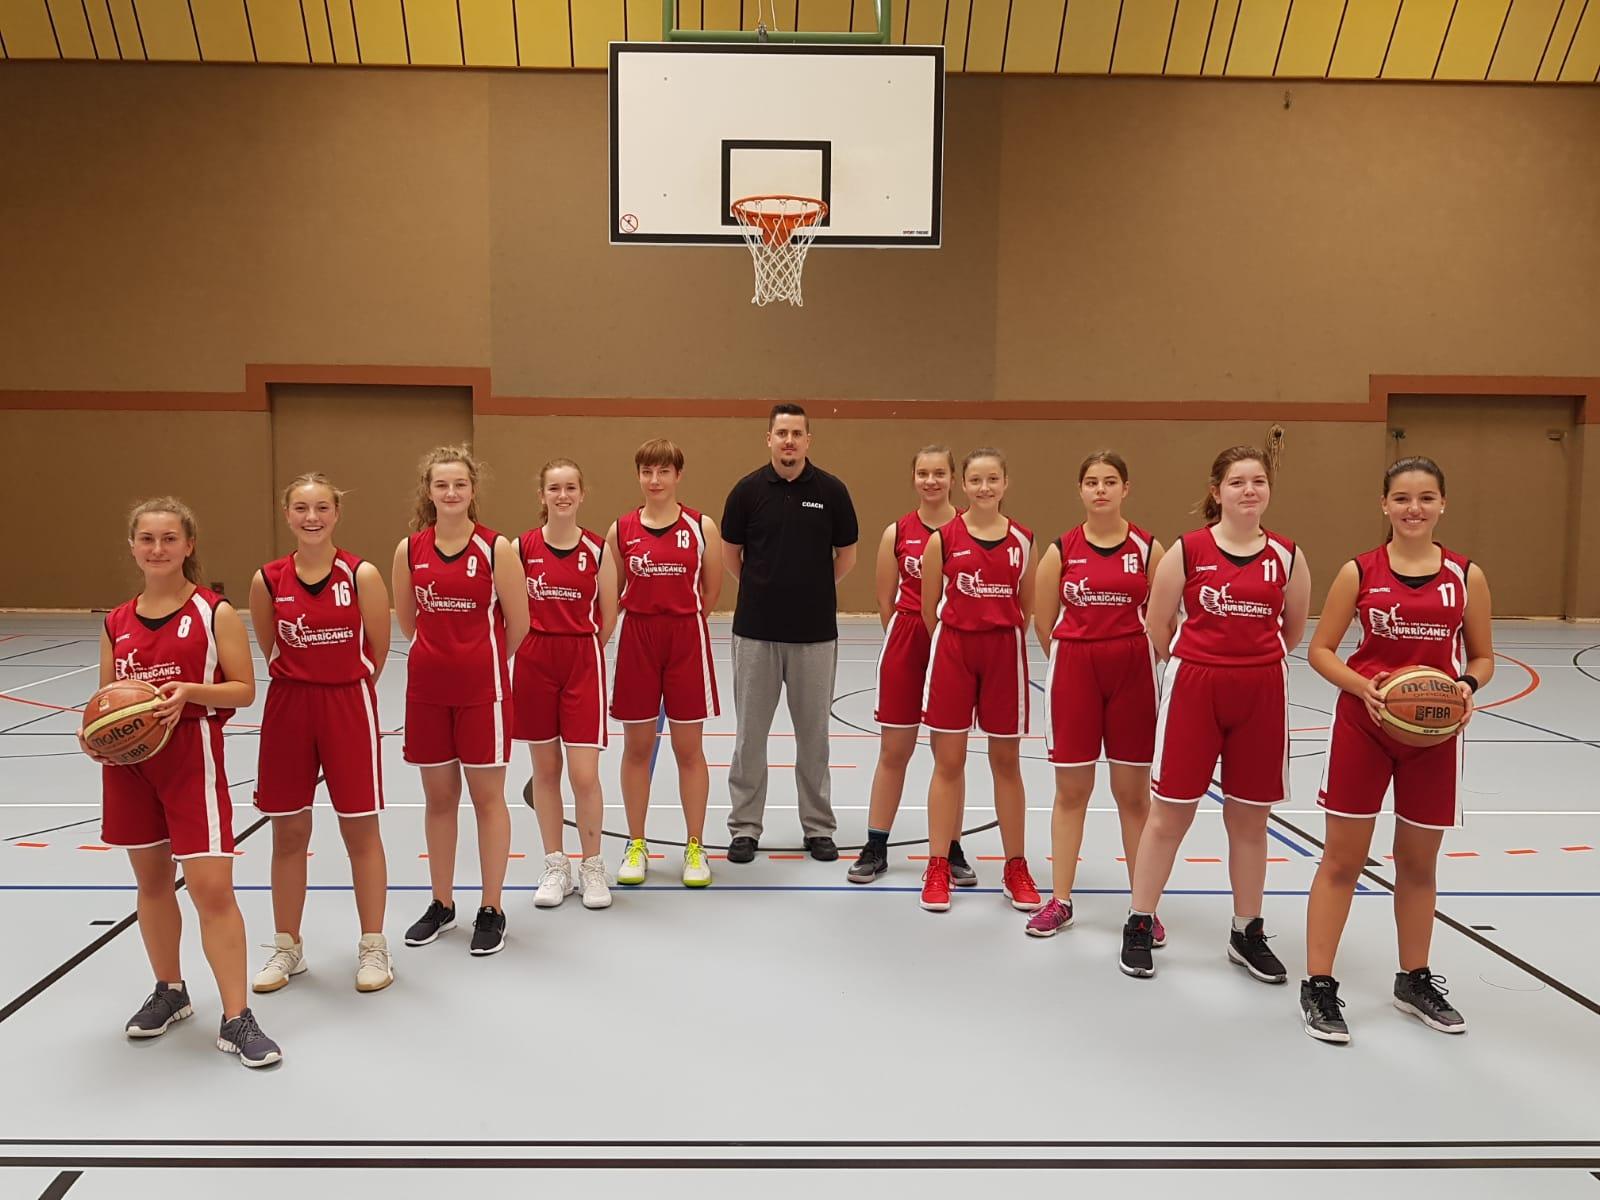 TSG Heidesheim - HURRICANES, U16/U18 weiblich